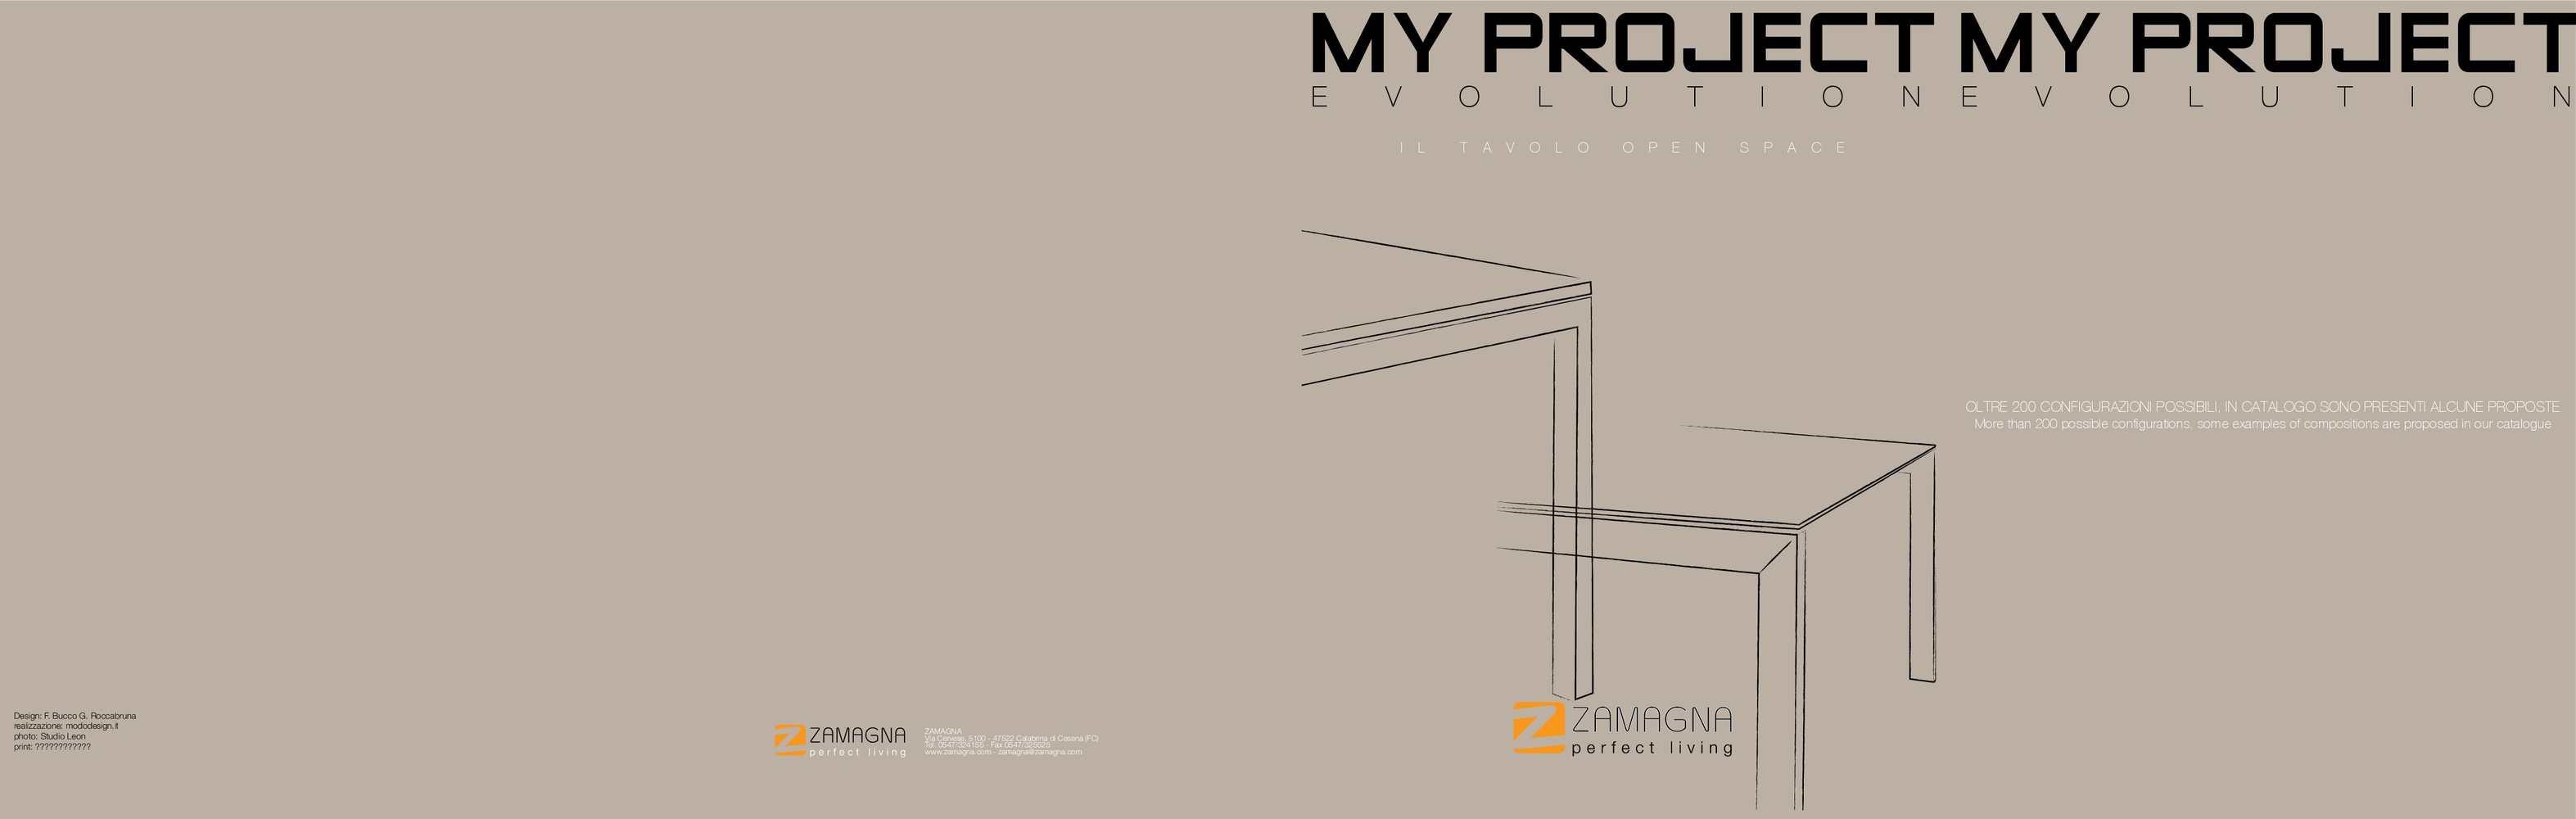 Calaméo - My Project